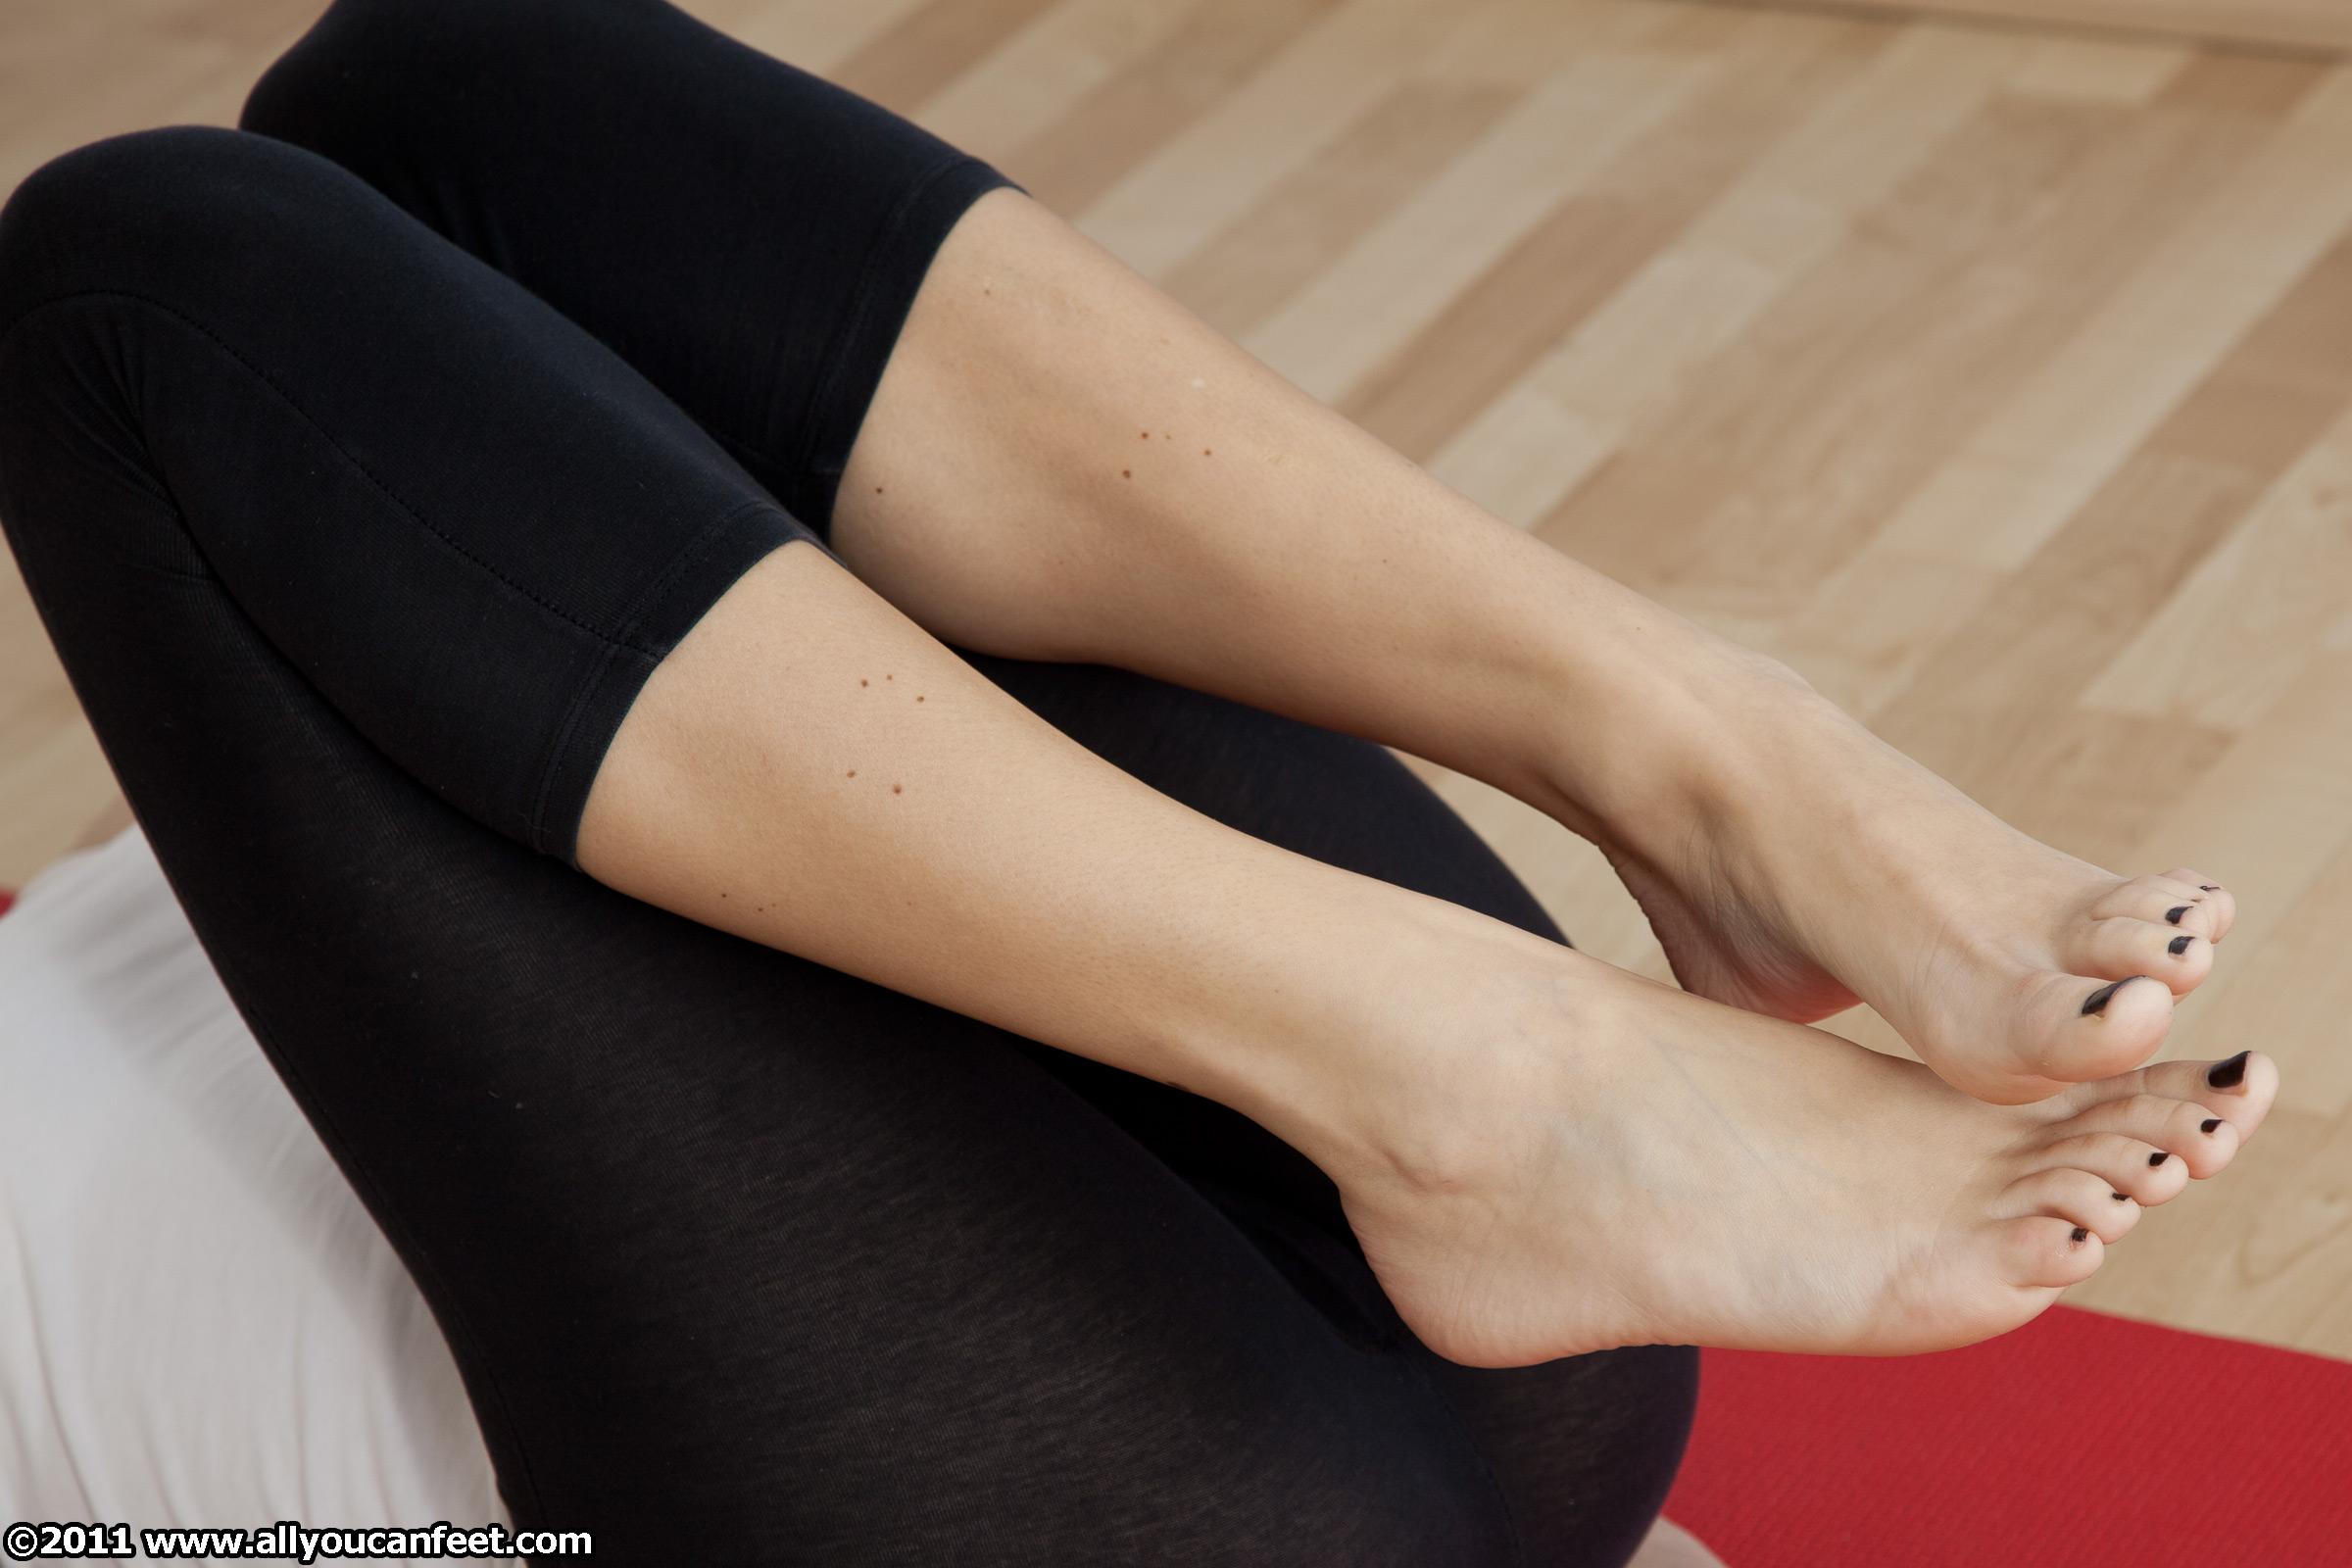 Tits Feet Patricia Benoit  nudes (61 photo), Twitter, legs